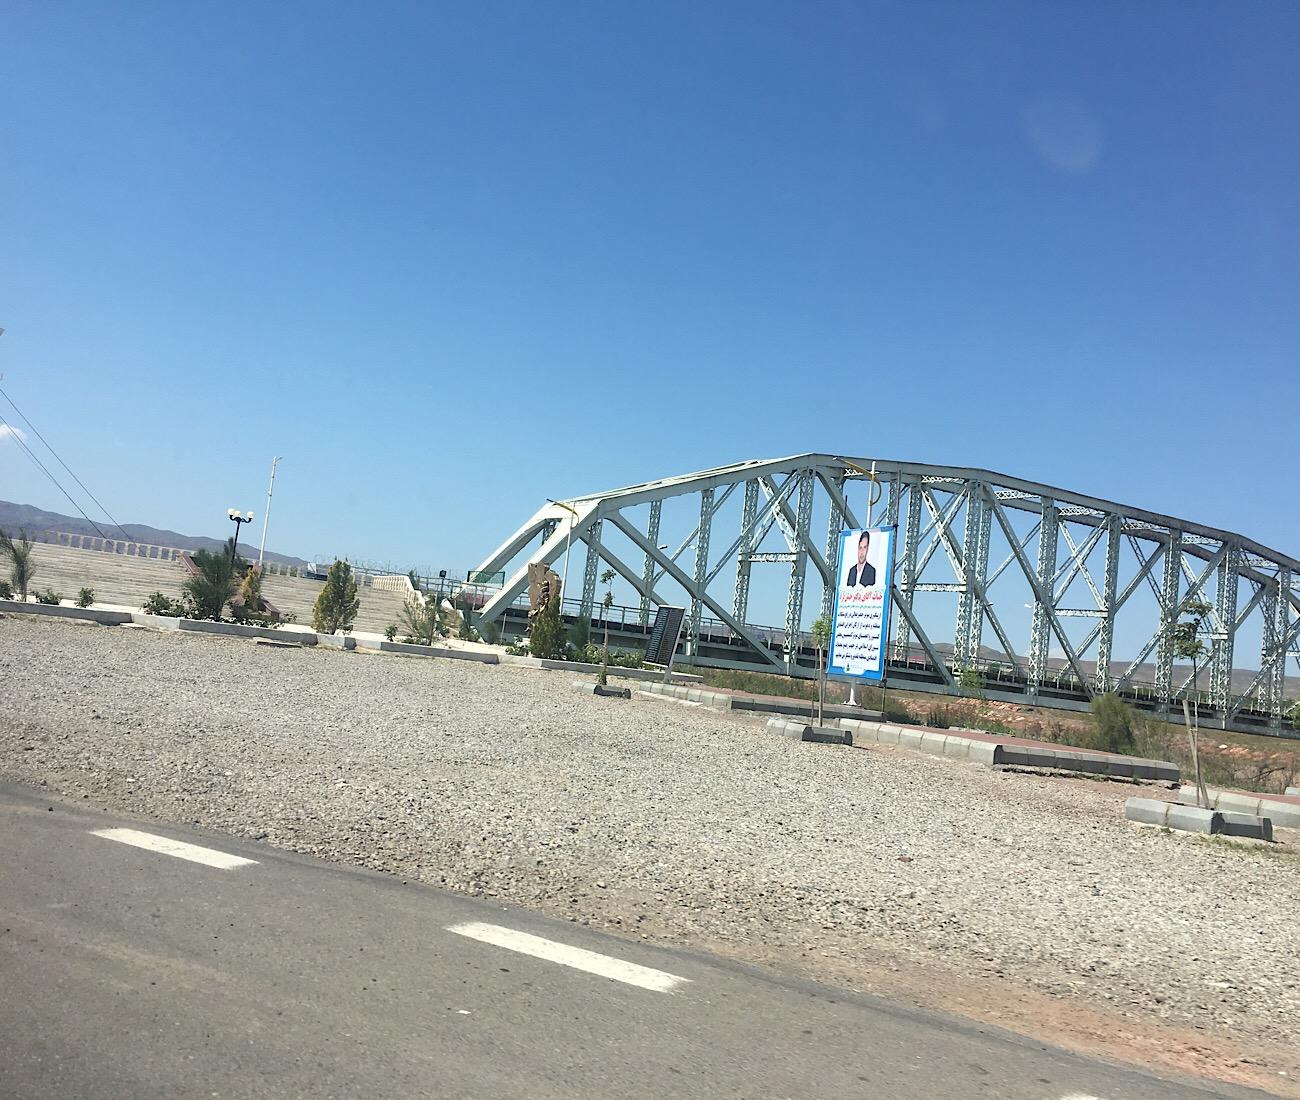 Gruzja-Armenia-Iran-Stambuł. Dzień 6: Nie jedna granica Iranu 17